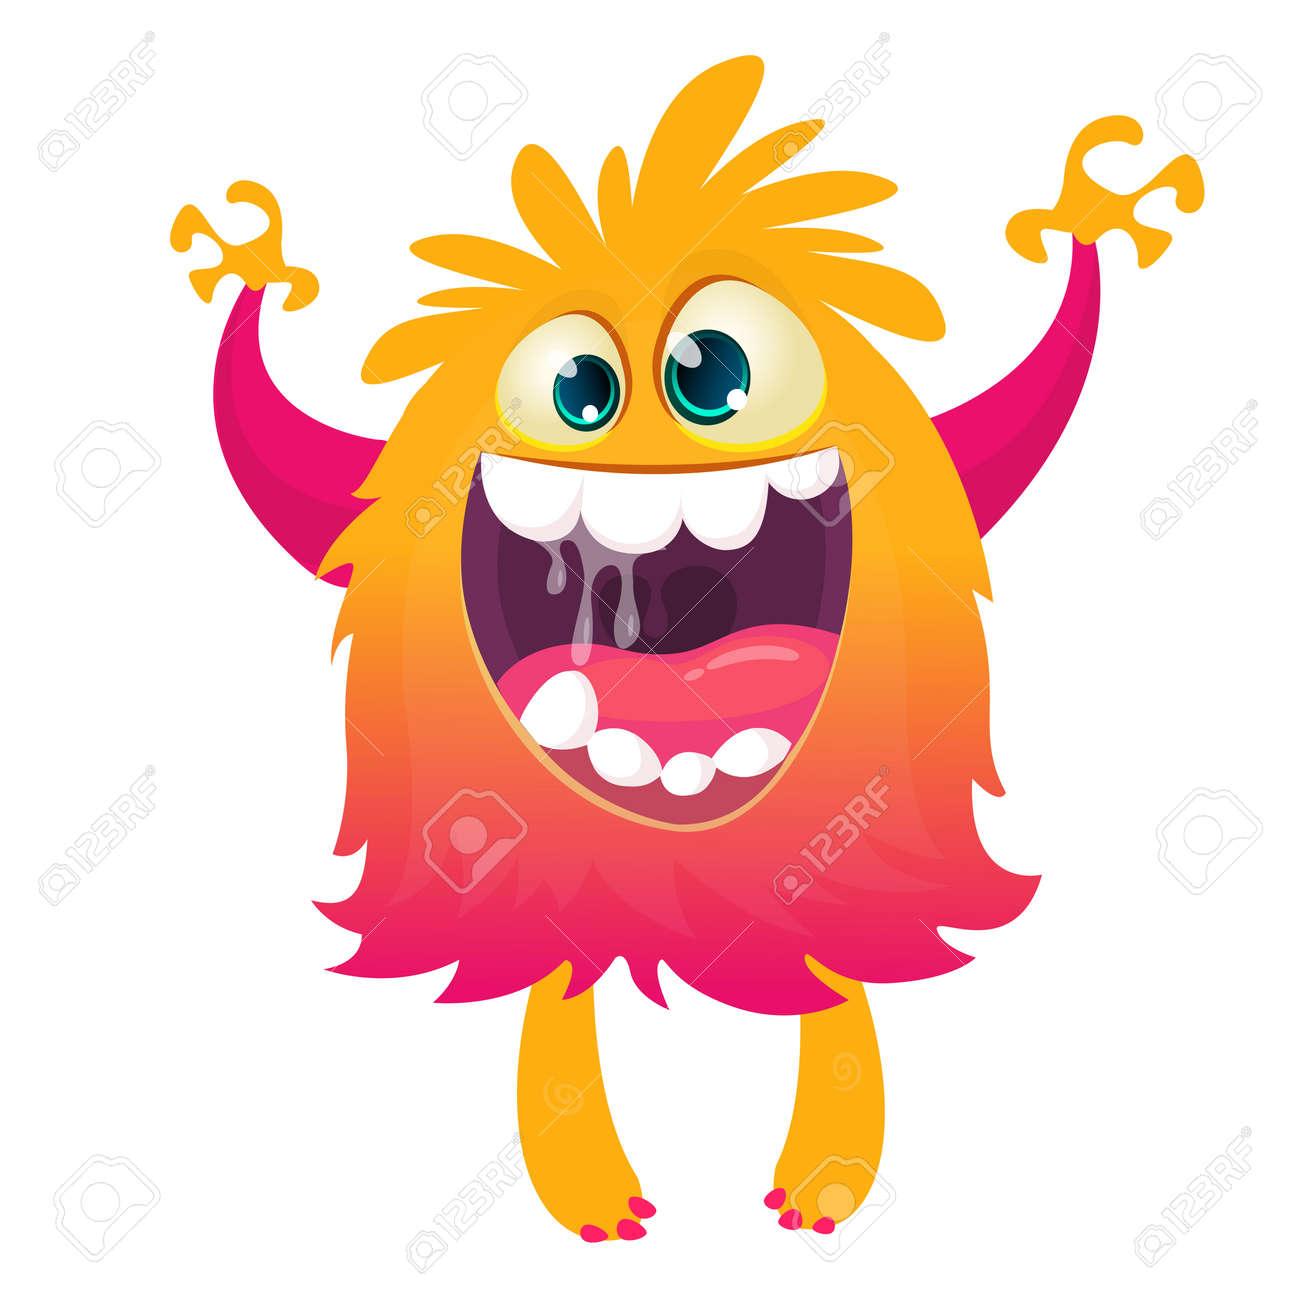 Happy cartoon monster. Halloween vector illustration - 154840710